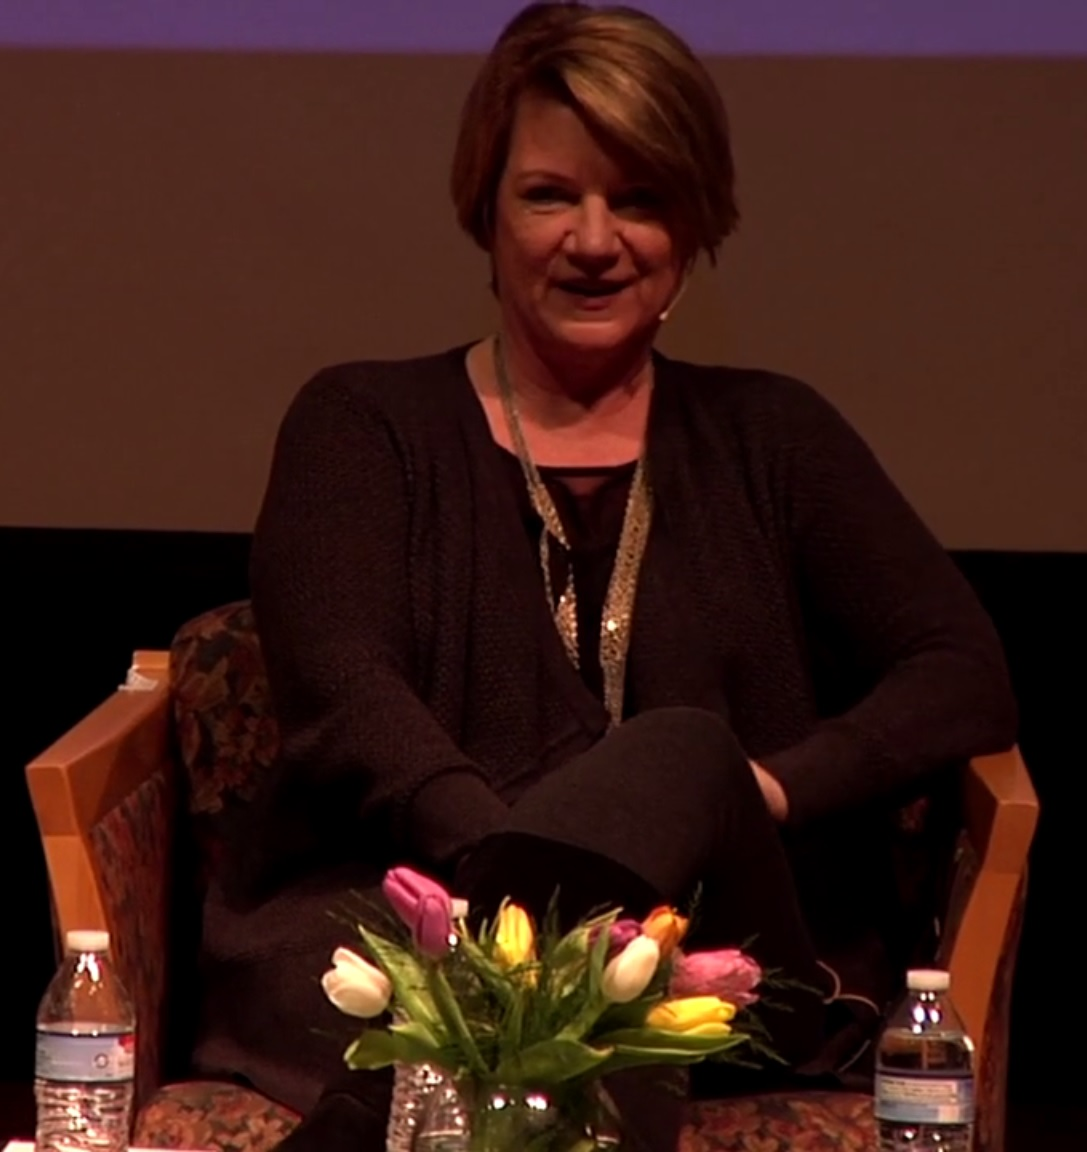 Jeanne Marie Laskas in 2016